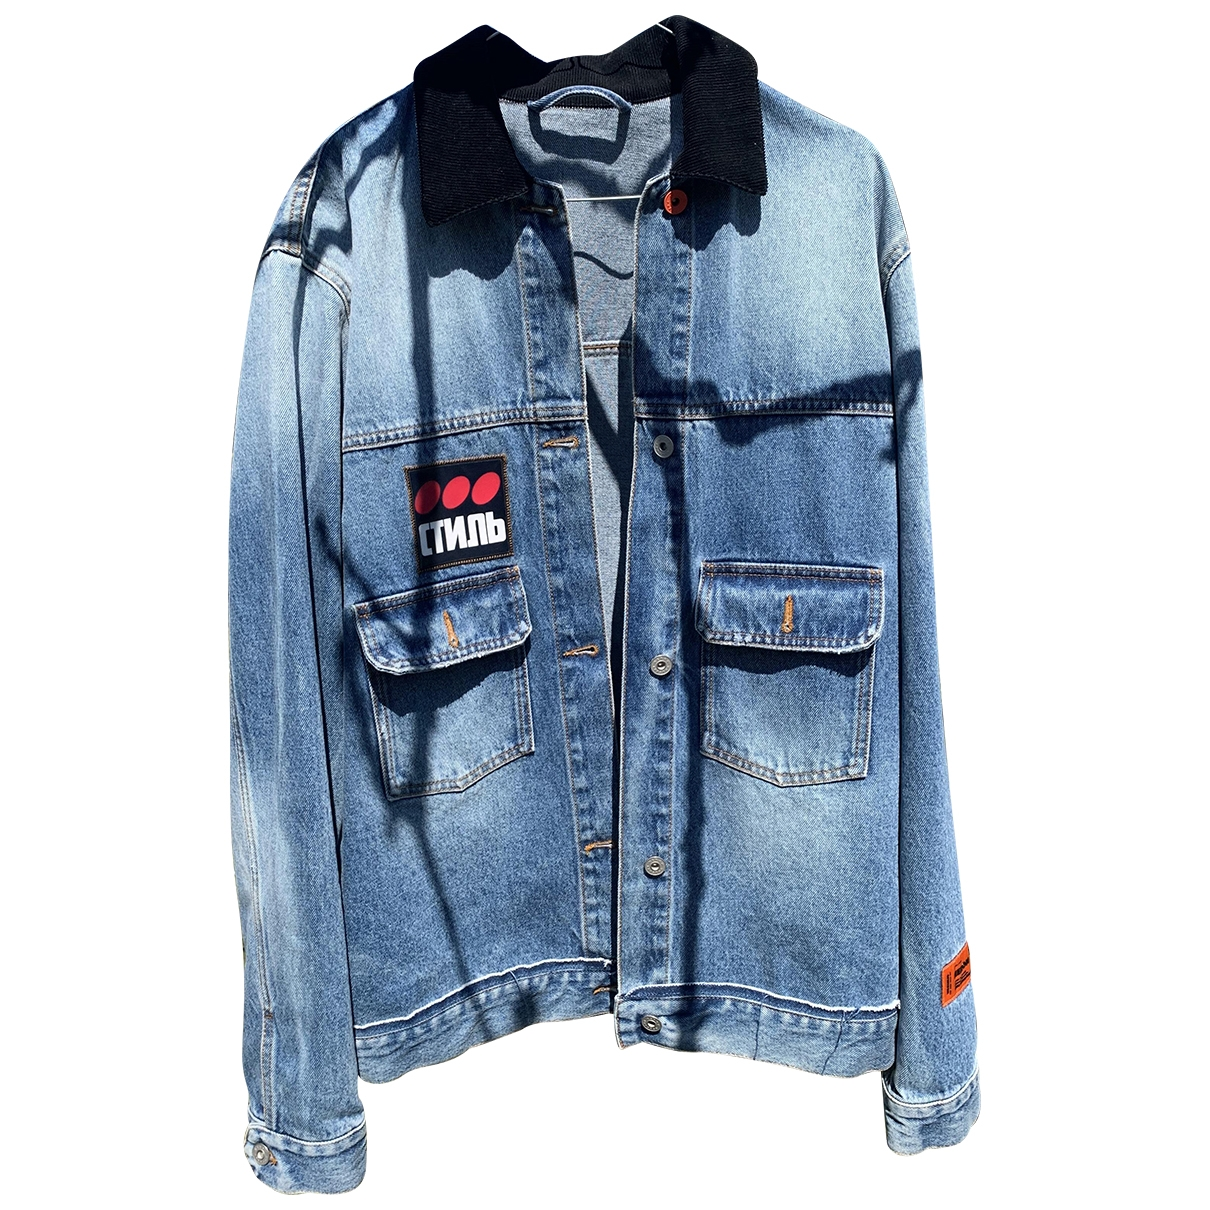 Heron Preston \N Denim - Jeans jacket  for Men L International